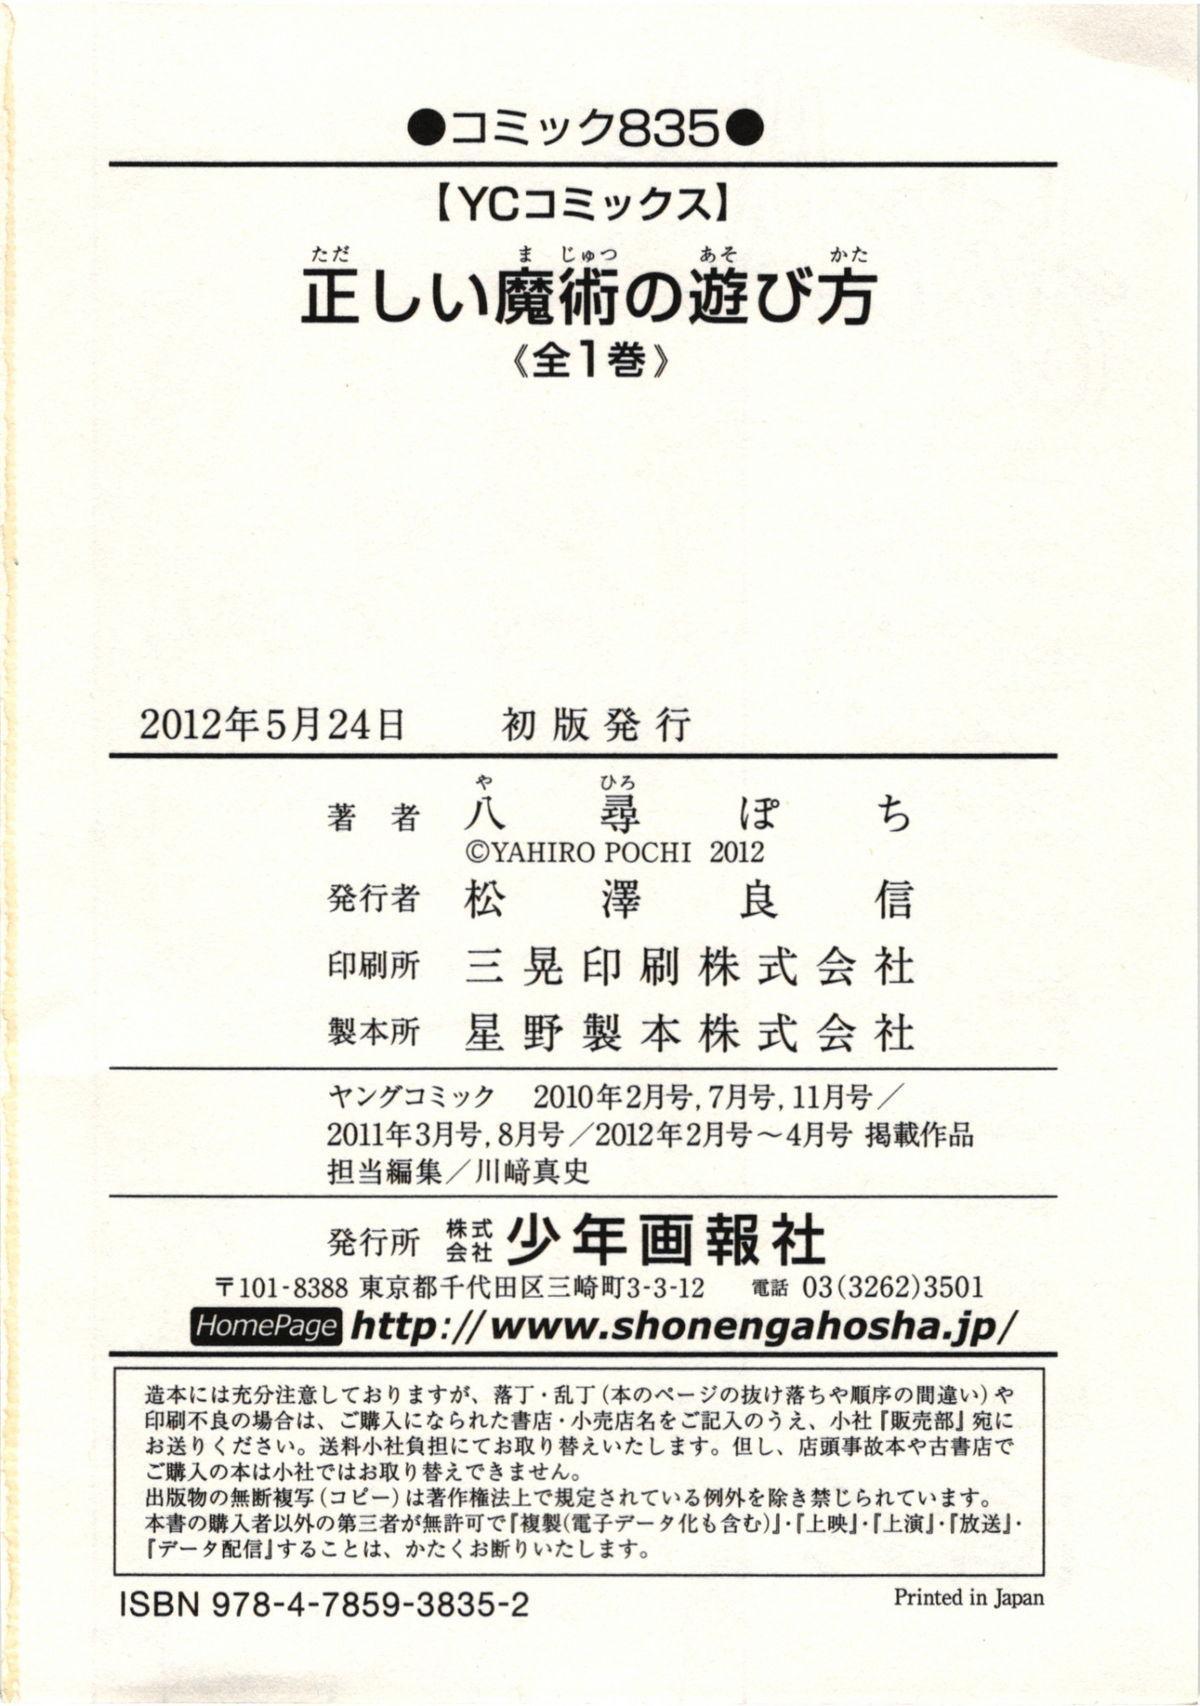 Tadashii Majutsu no Asobikata - The right way of playing of magic. 164